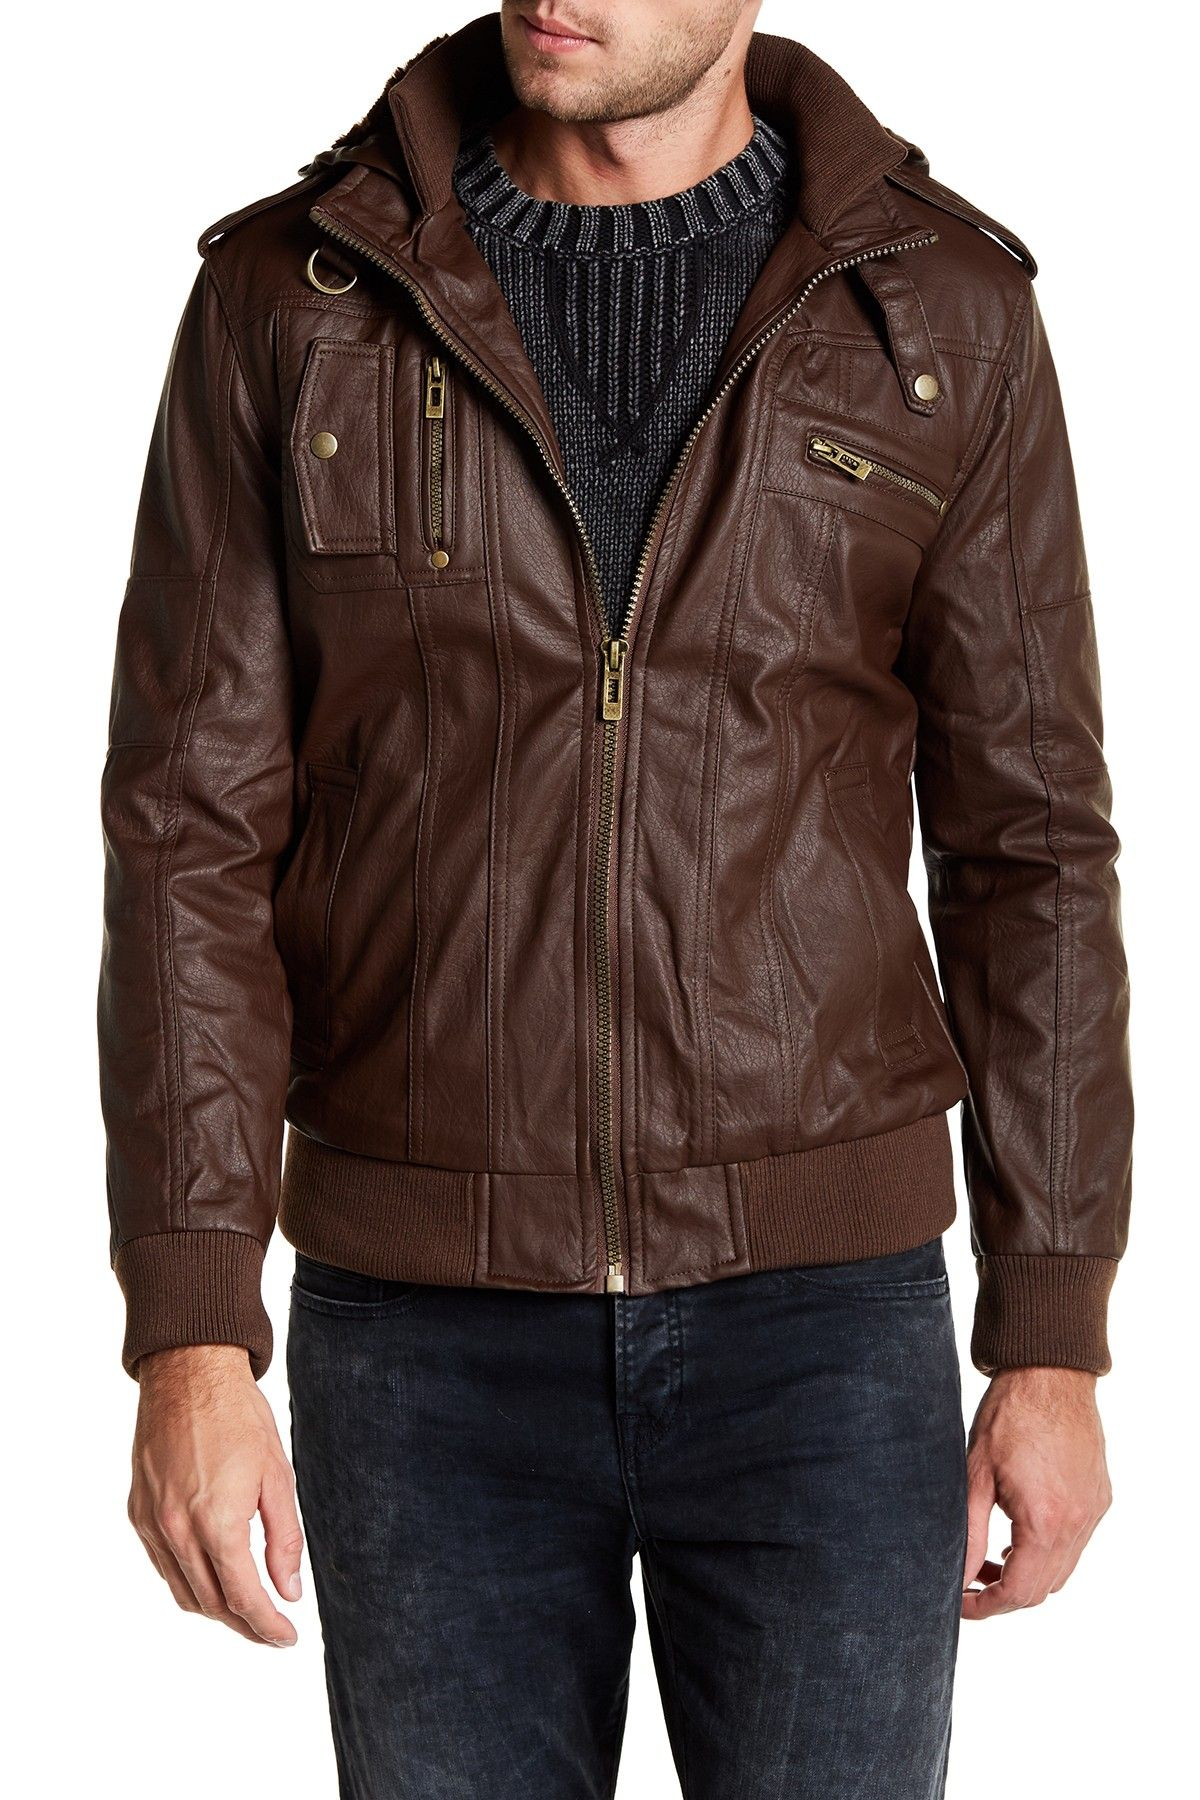 Yoki Hooded Classic Biker Jacket Nordstrom Rack Biker Jacket Jackets Mens Fashion Suits [ 1800 x 1200 Pixel ]